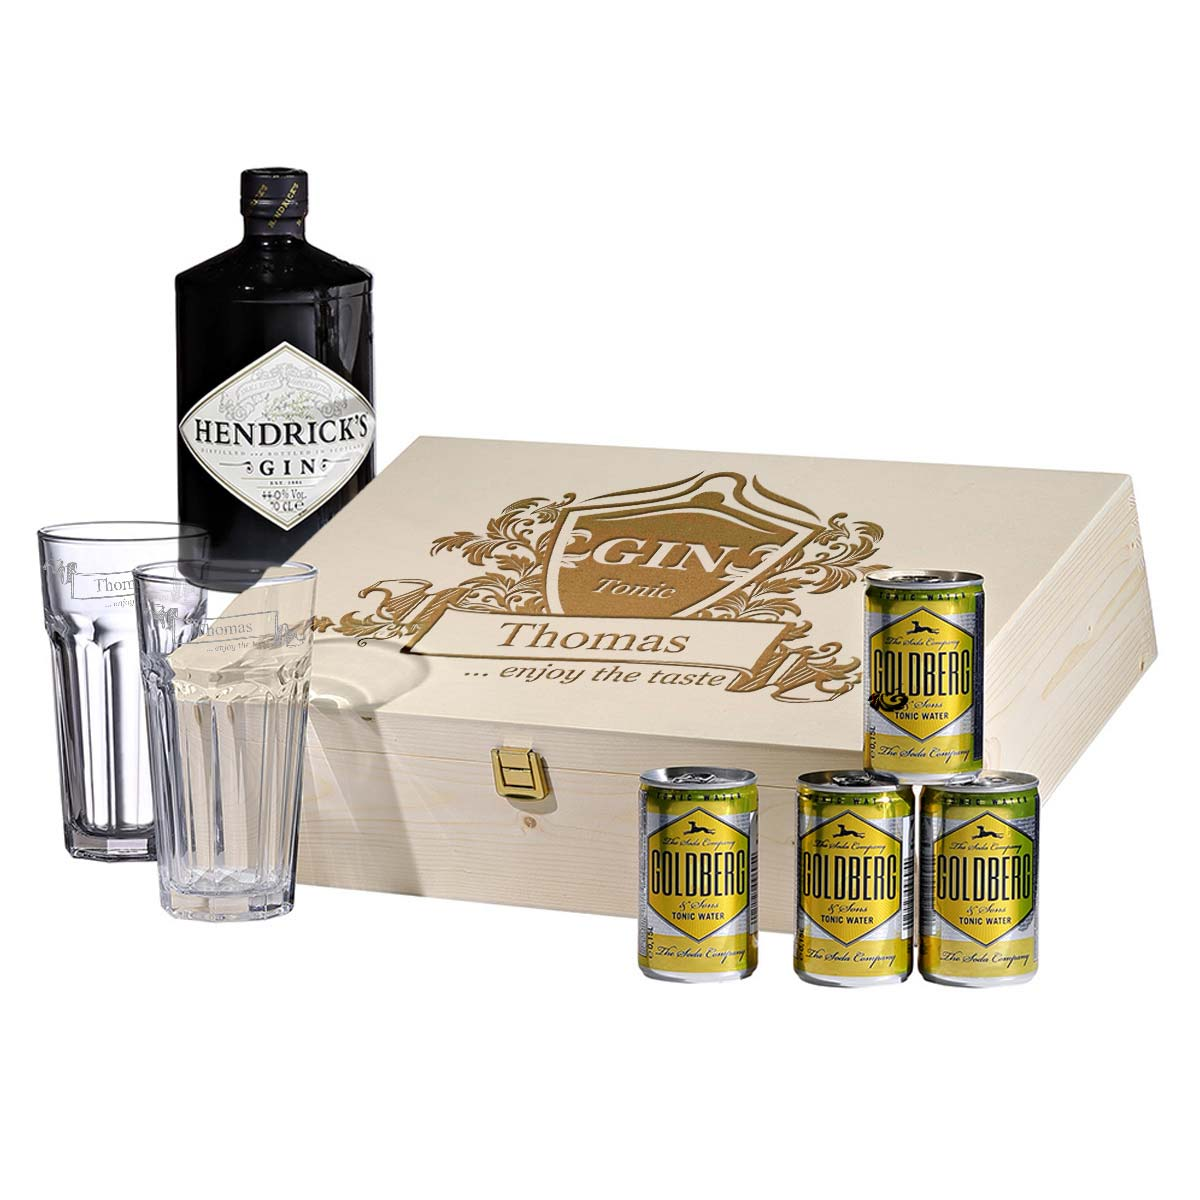 Gravur Motiv enjoy the taste 8-teiliges Geschenkset Hendrick/'s Gin Tonic inkl